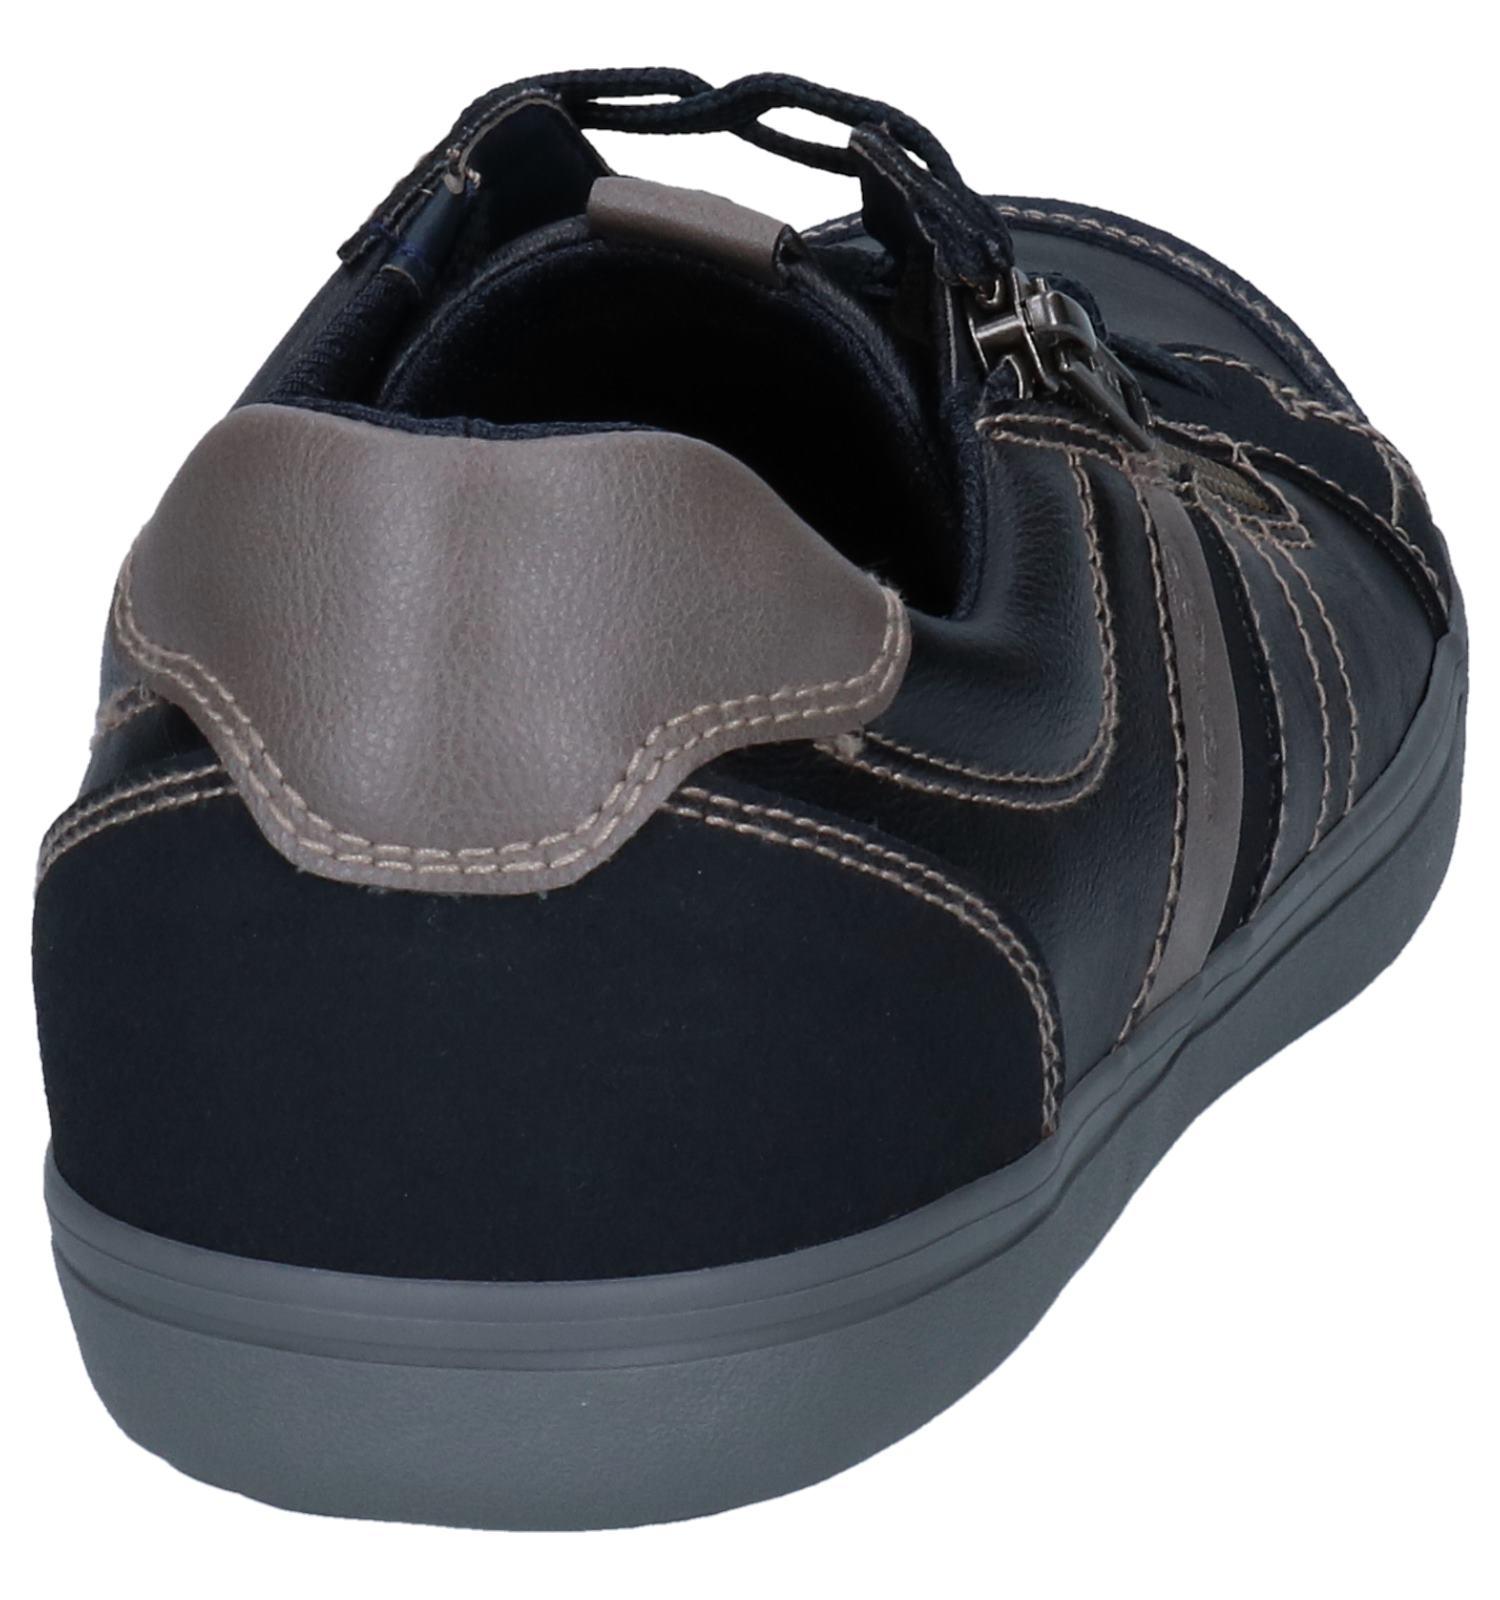 Casual Casual Schoenen Geox Geox Donkerblauwe Schoenen Geox Halver Donkerblauwe Halver 9EID2H